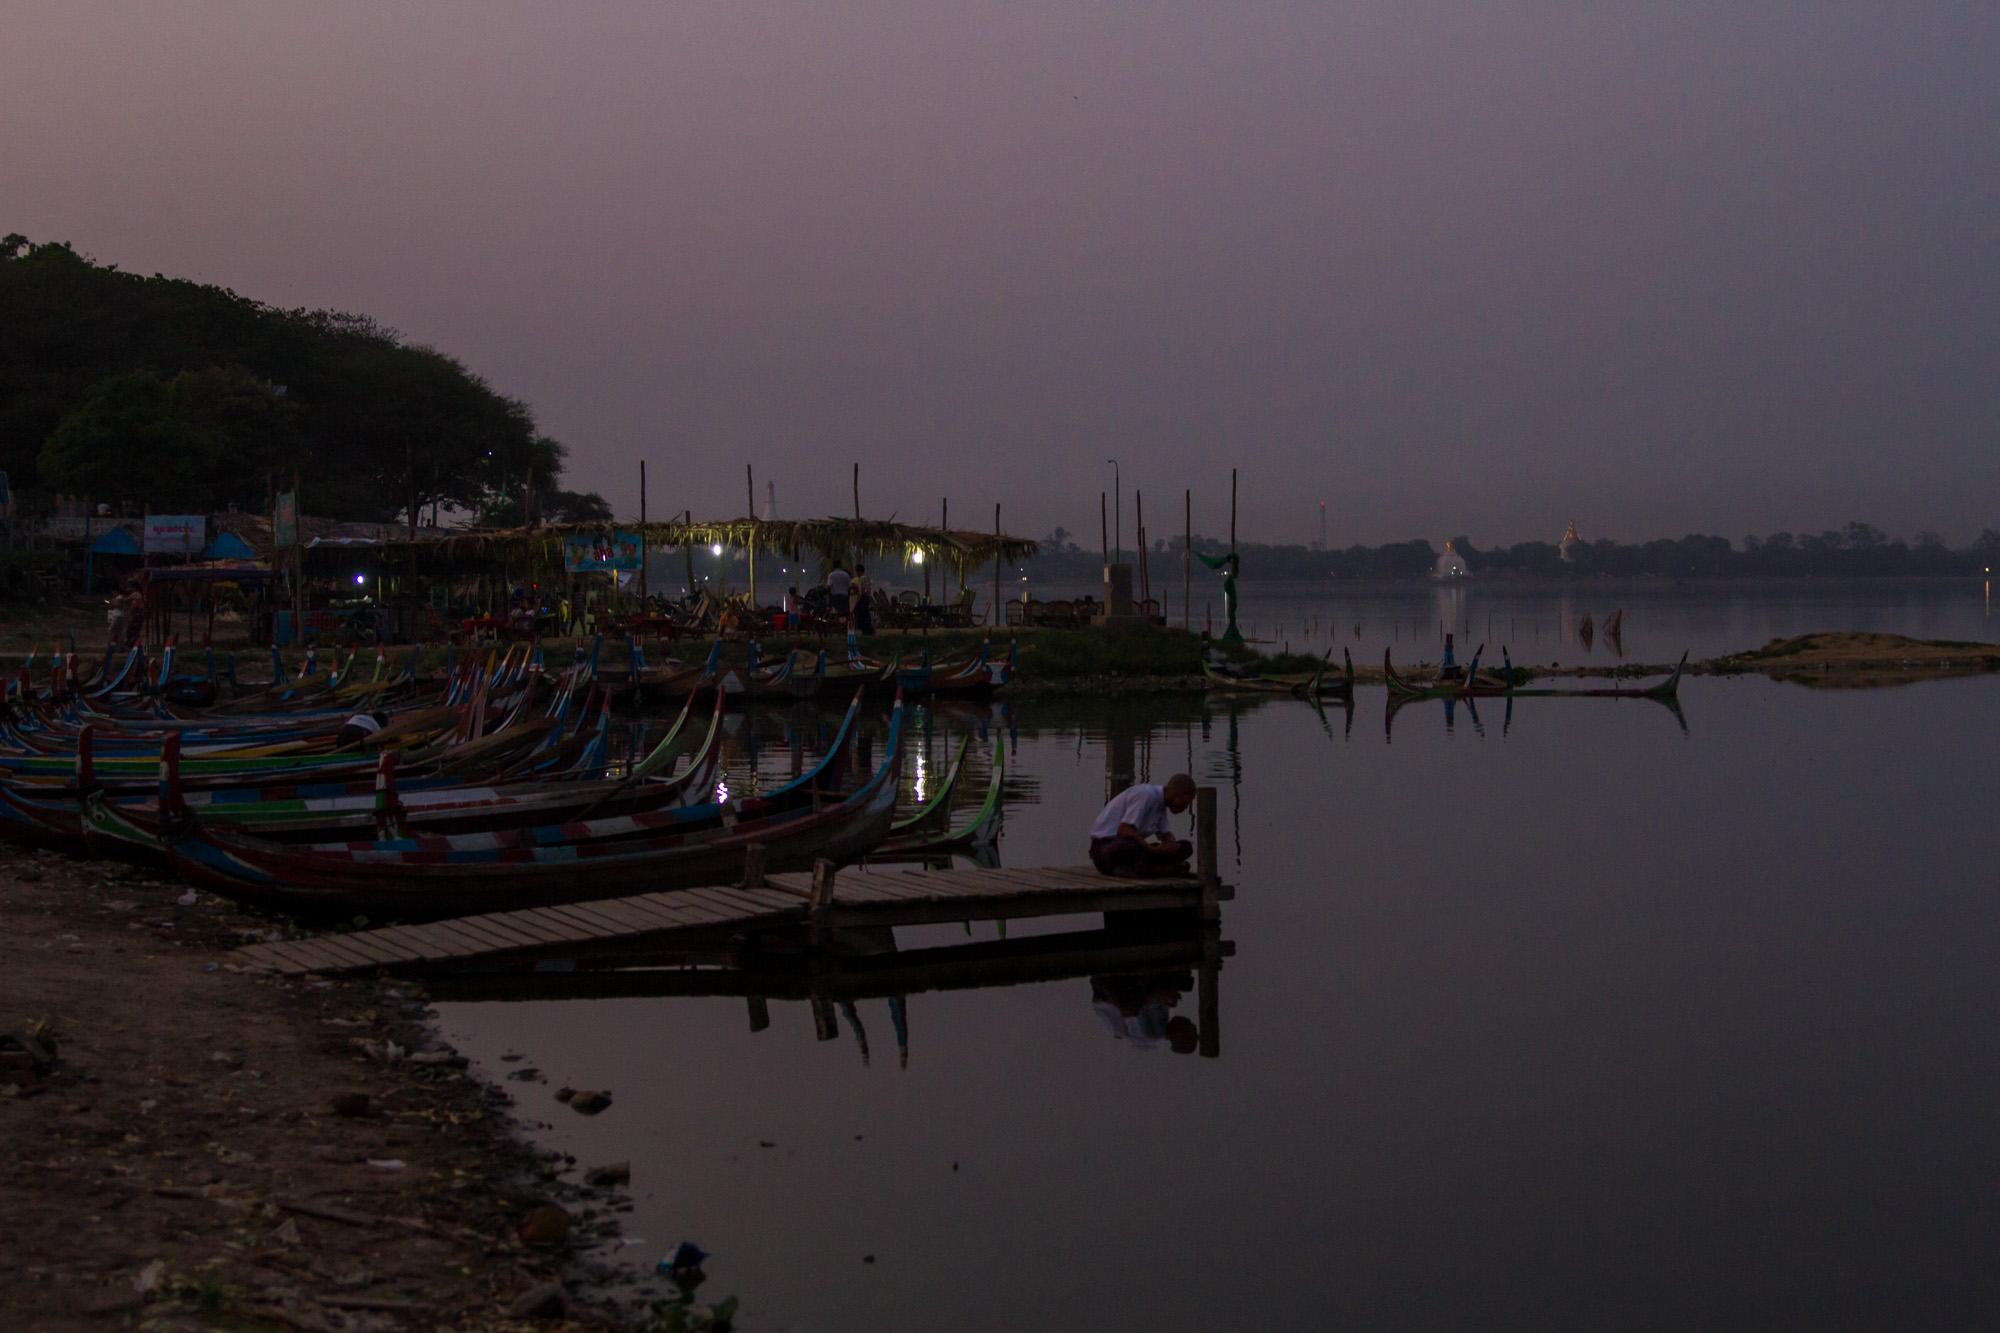 Young Burmeseon the pier at Taunghtaman lake.